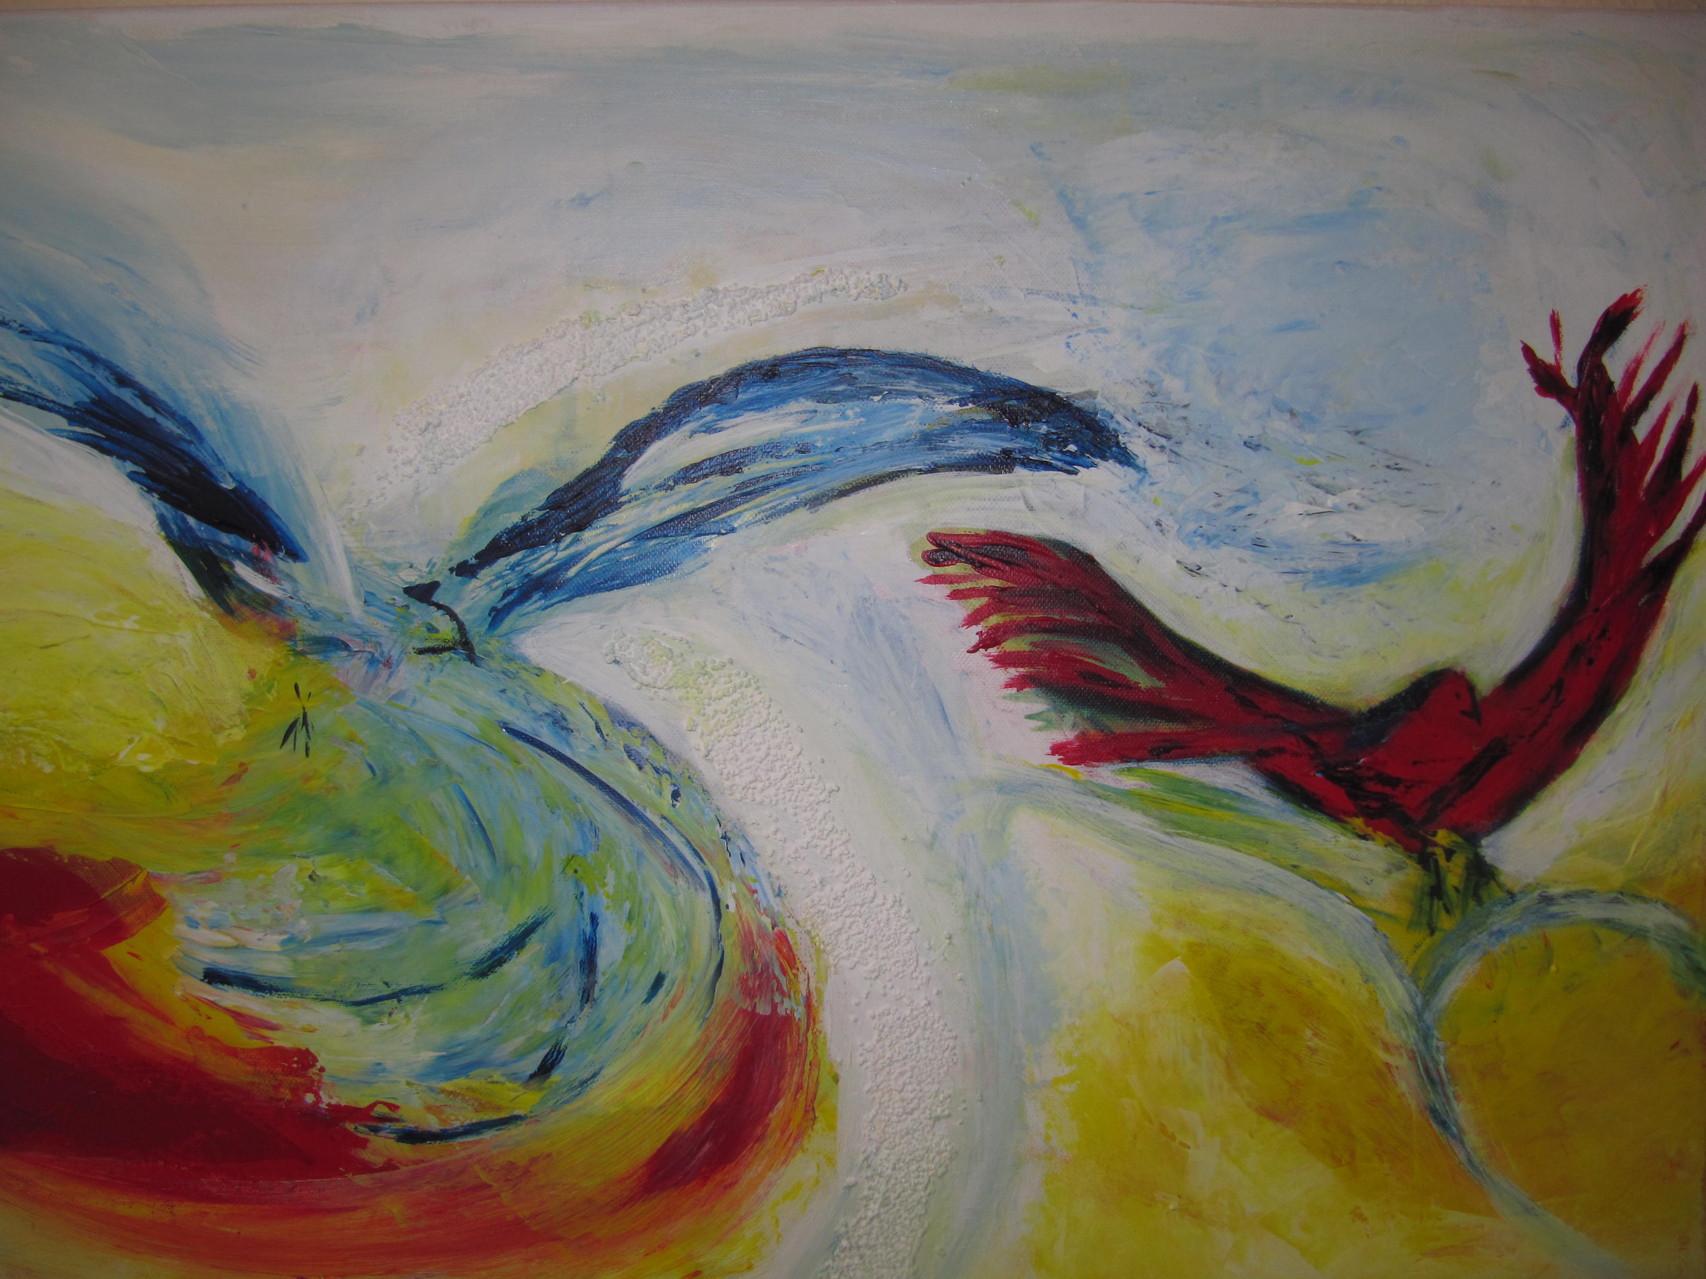 Paradiesvögel 50 x 80 Acryl auf Leinwand Spachteltechnik